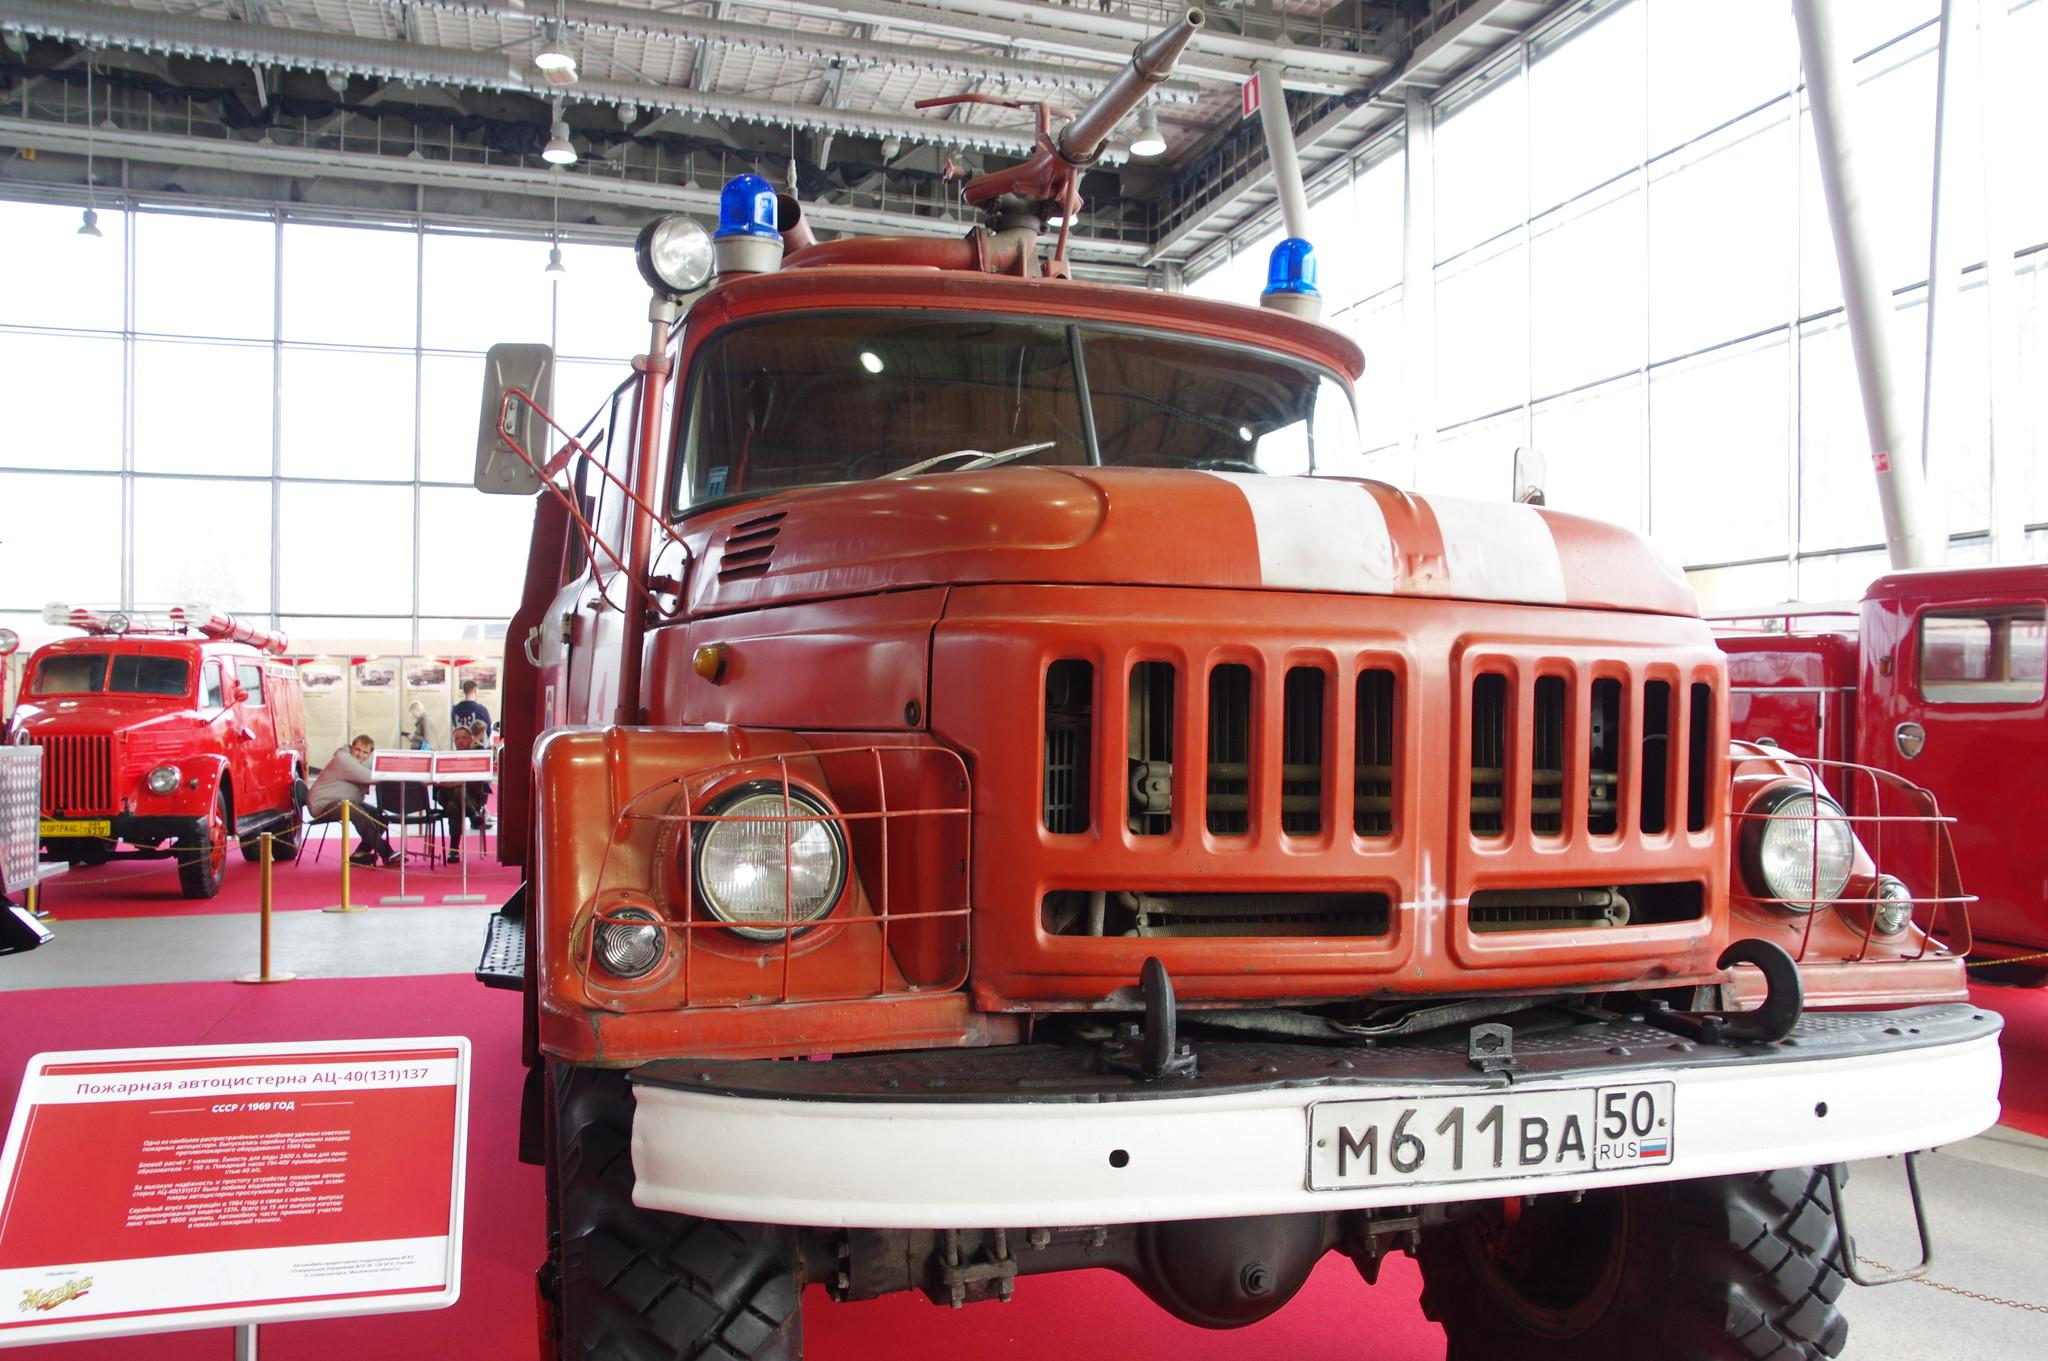 Пожарная автоцистерна АЦ-40(131)137. 1969 год